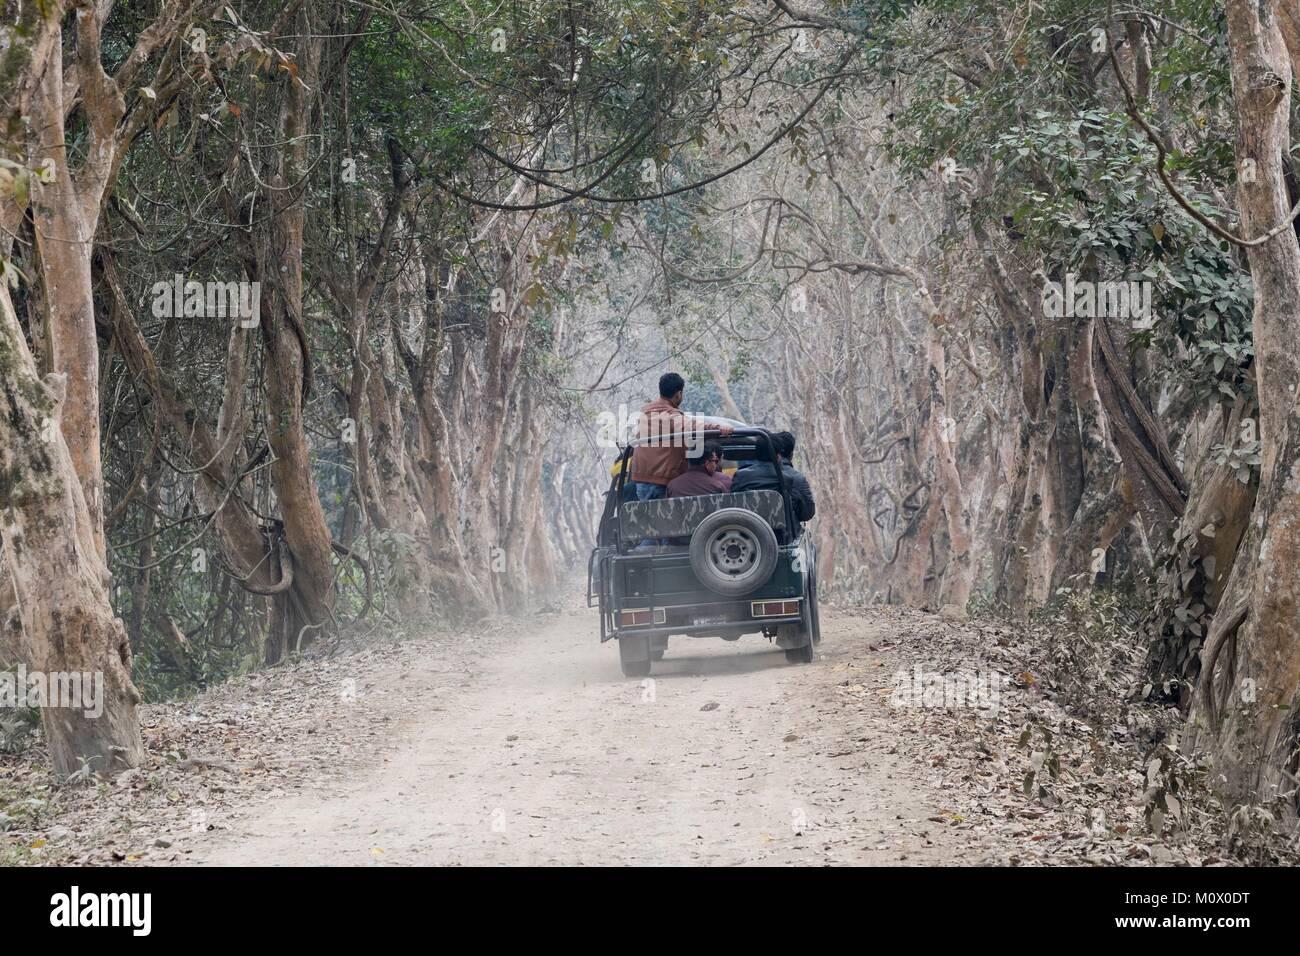 India,State of Assam,Kaziranga National Park,trail in a tree lane,safari in the park - Stock Image